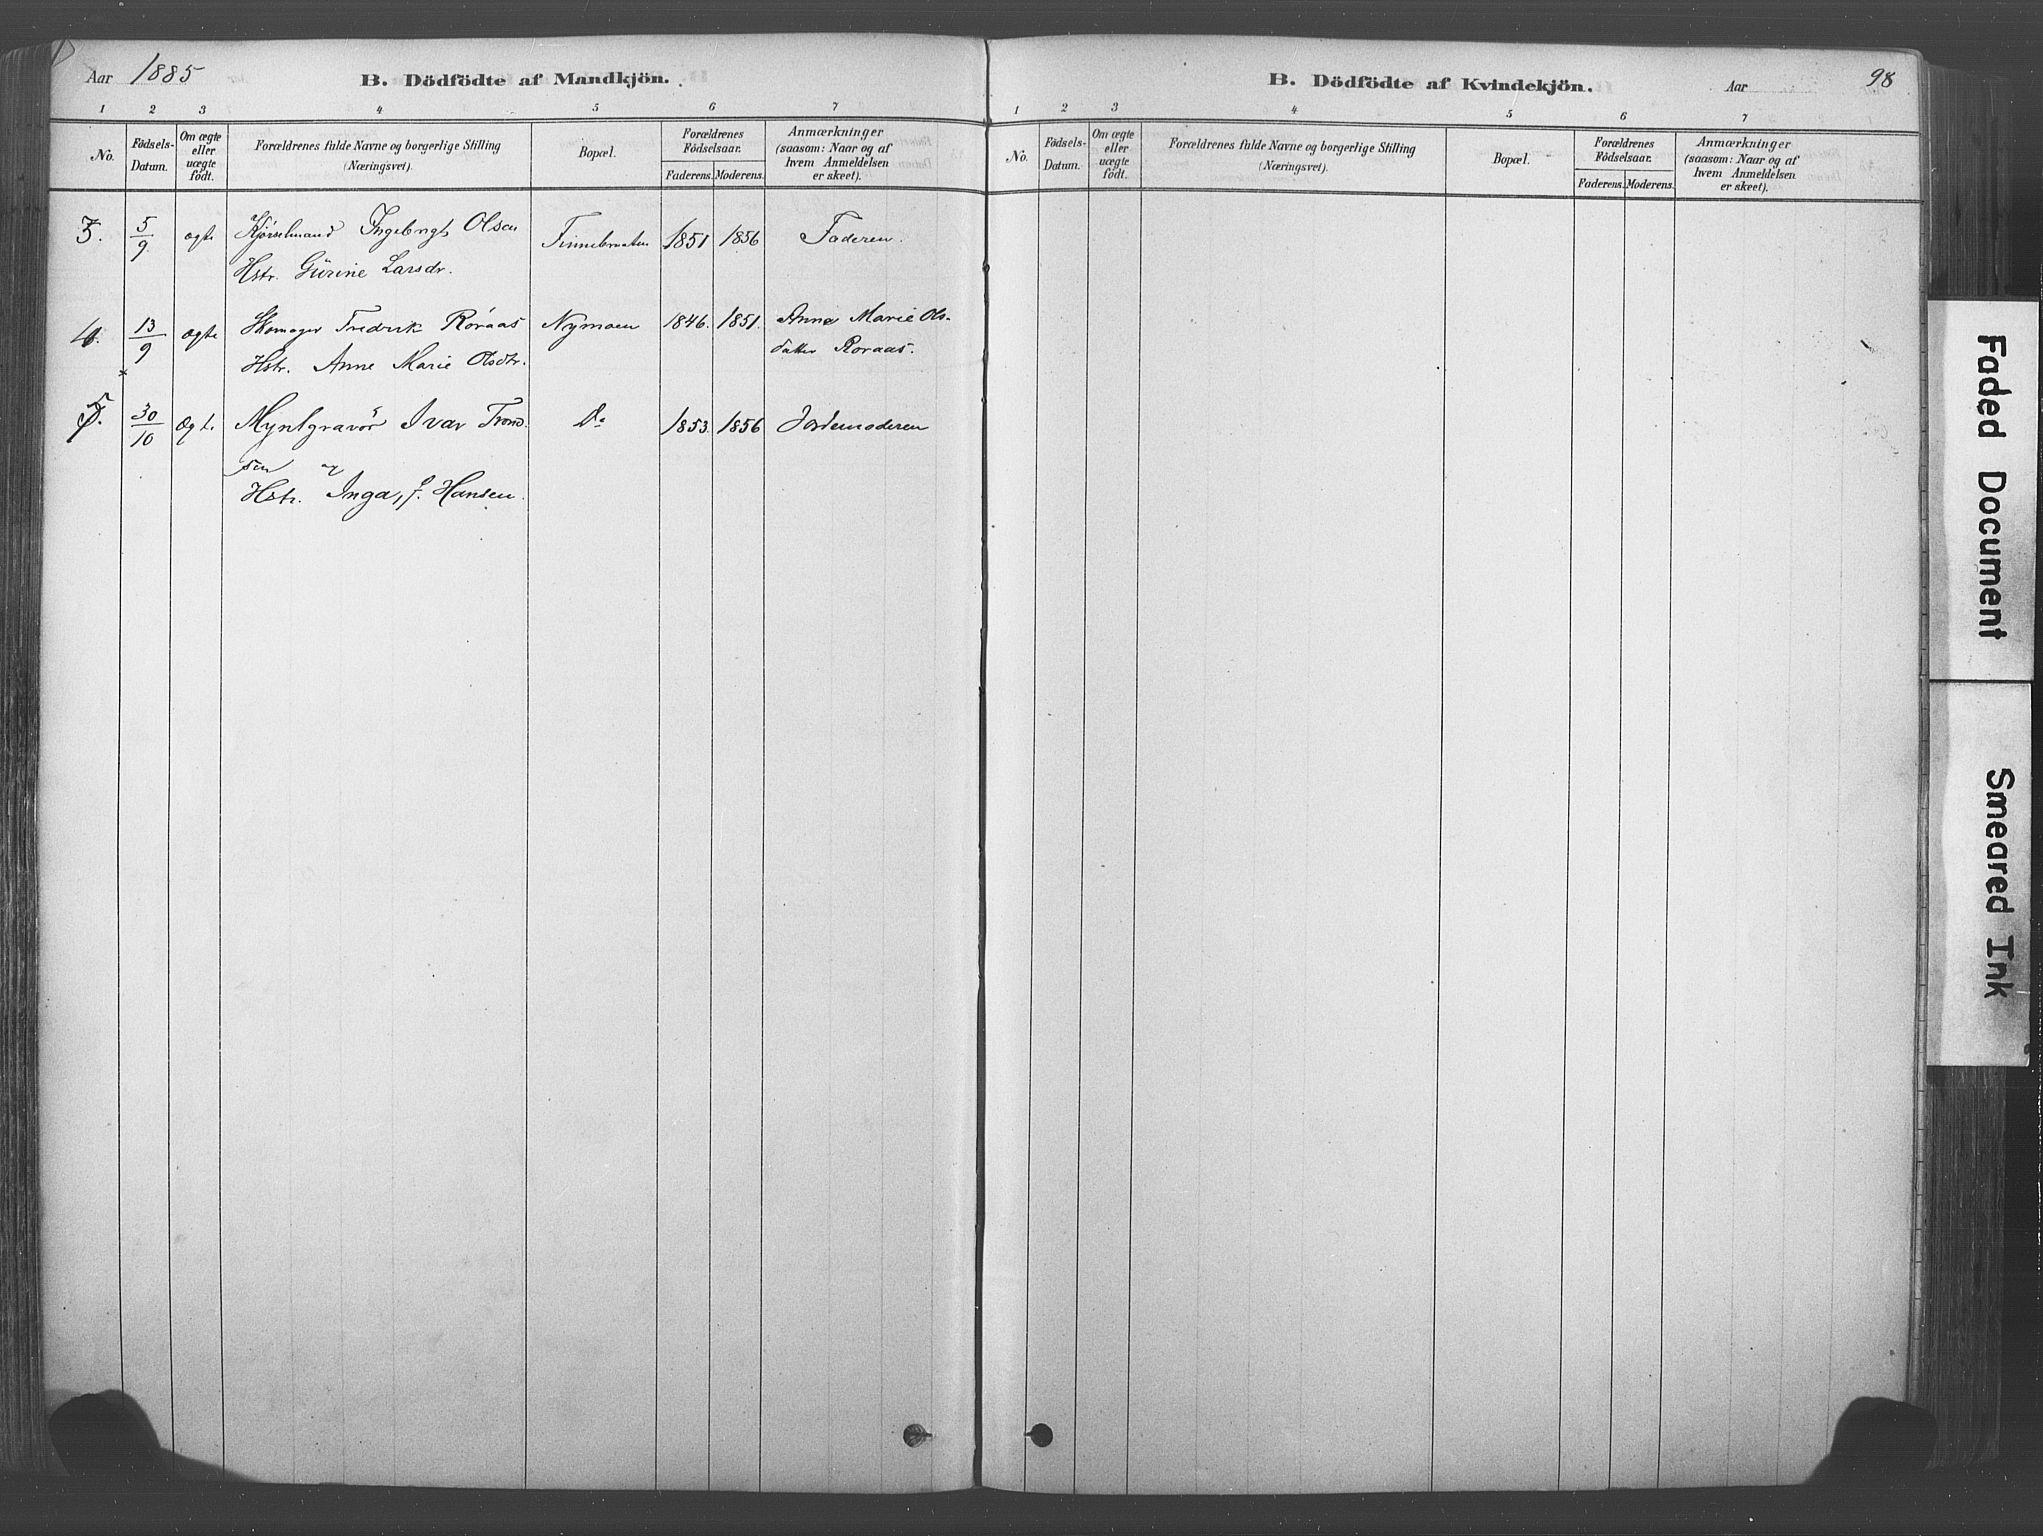 SAKO, Kongsberg kirkebøker, F/Fb/L0001: Ministerialbok nr. II 1, 1878-1886, s. 98